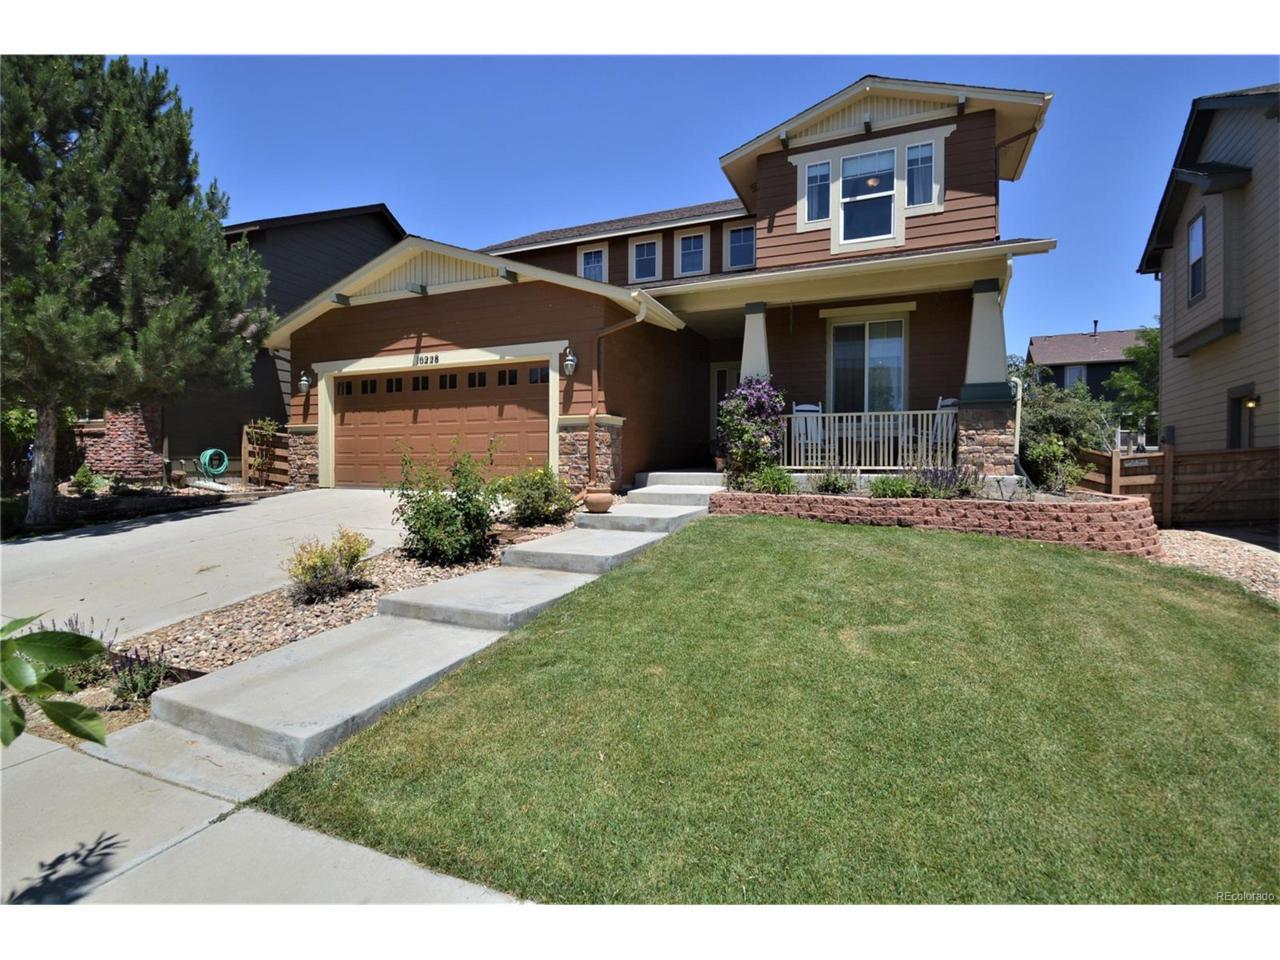 10228 Uravan Street, Commerce City, CO 80022 (MLS #9884329) :: 8z Real Estate